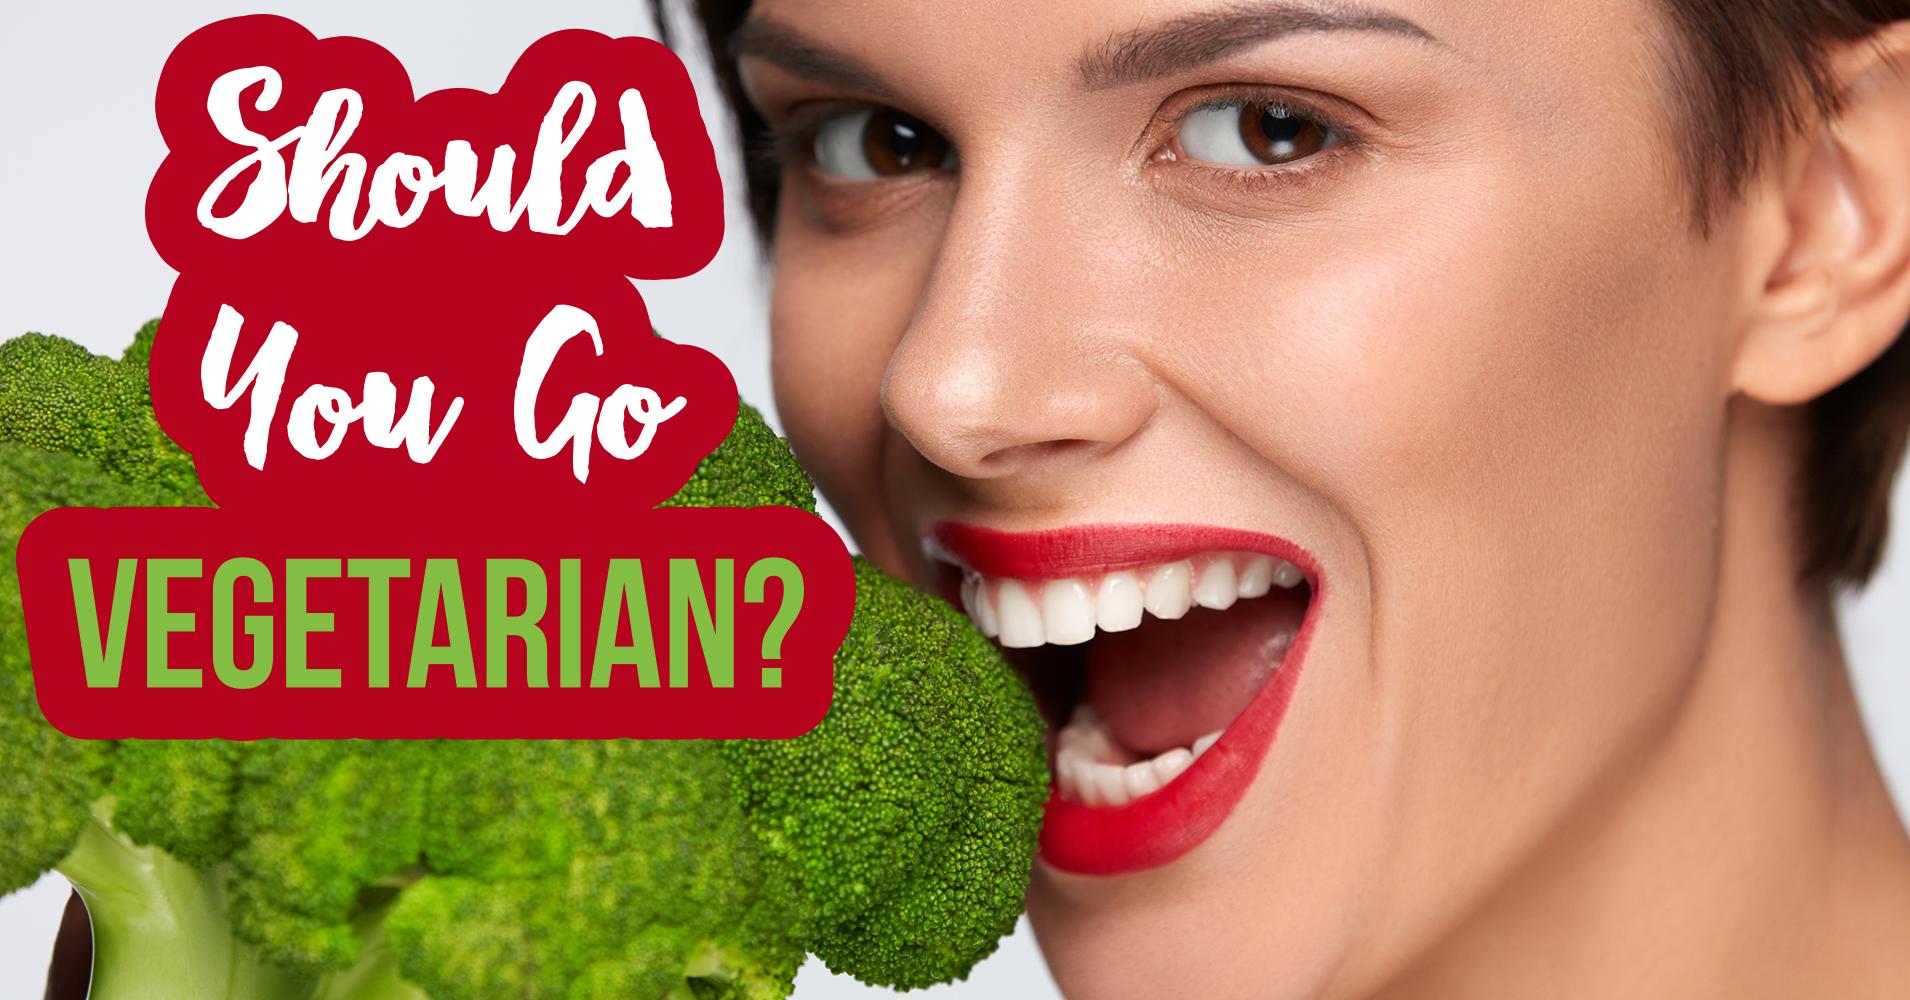 Should You Go Vegetarian?